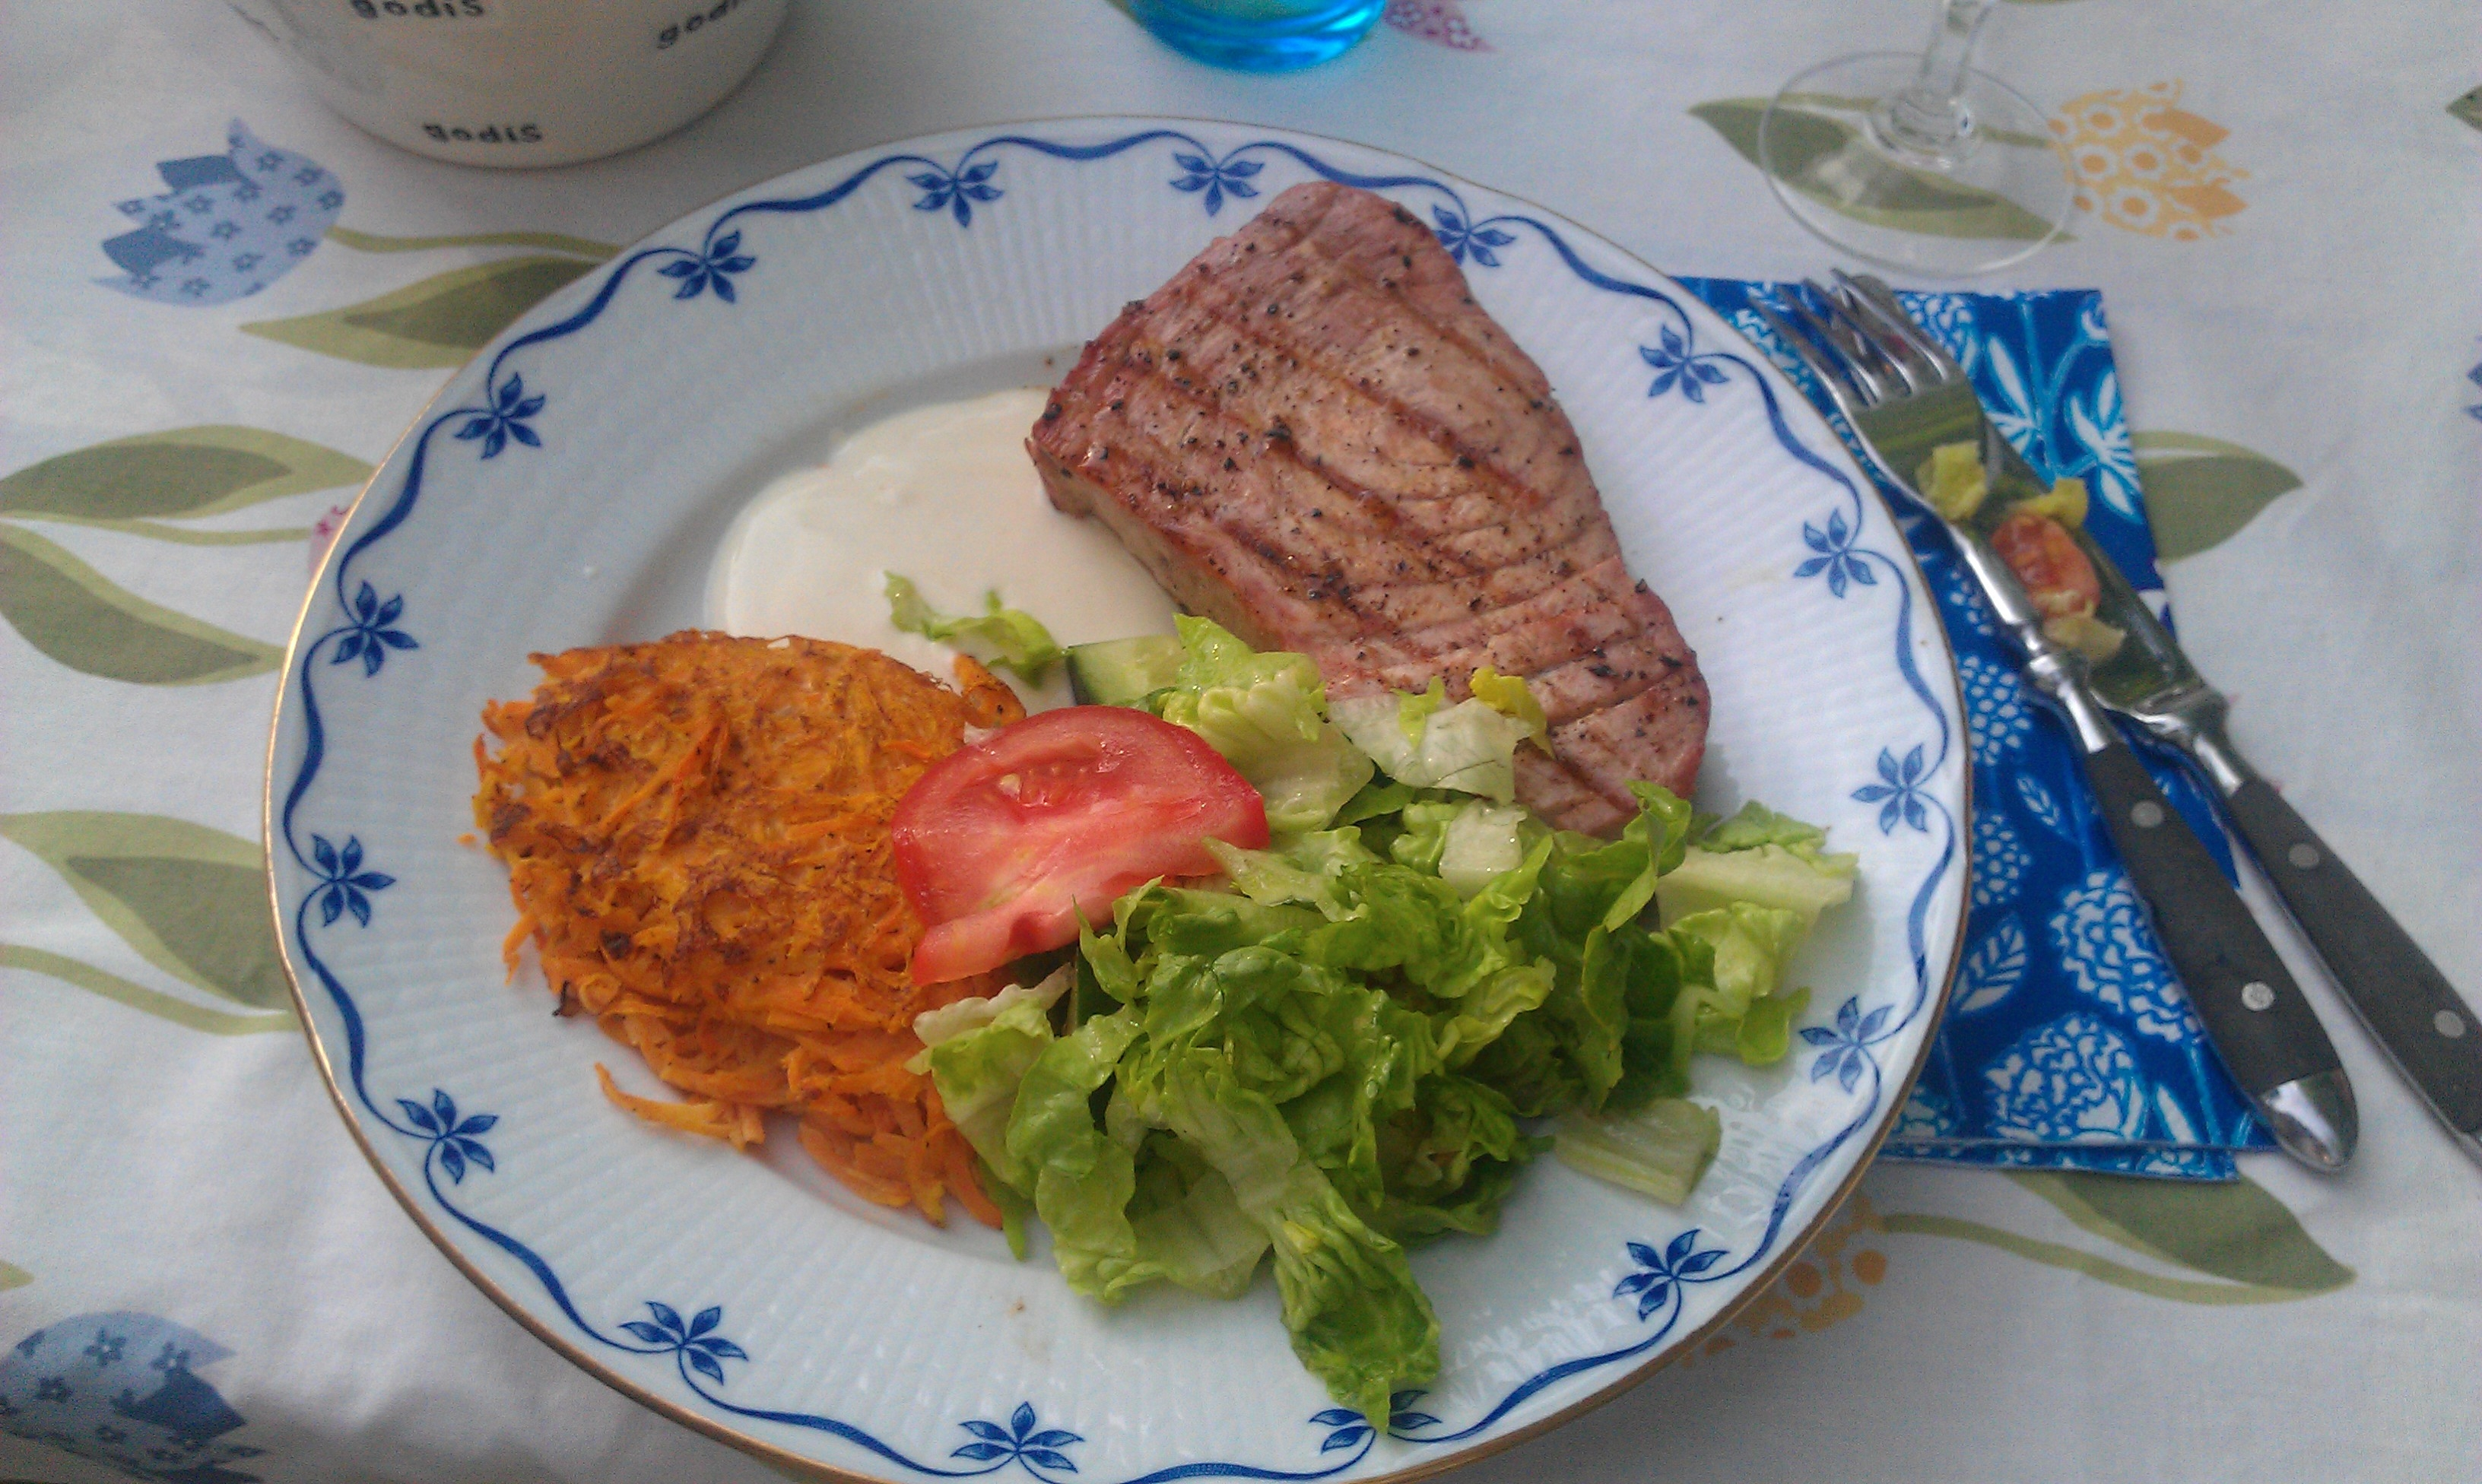 äta fettfri mat